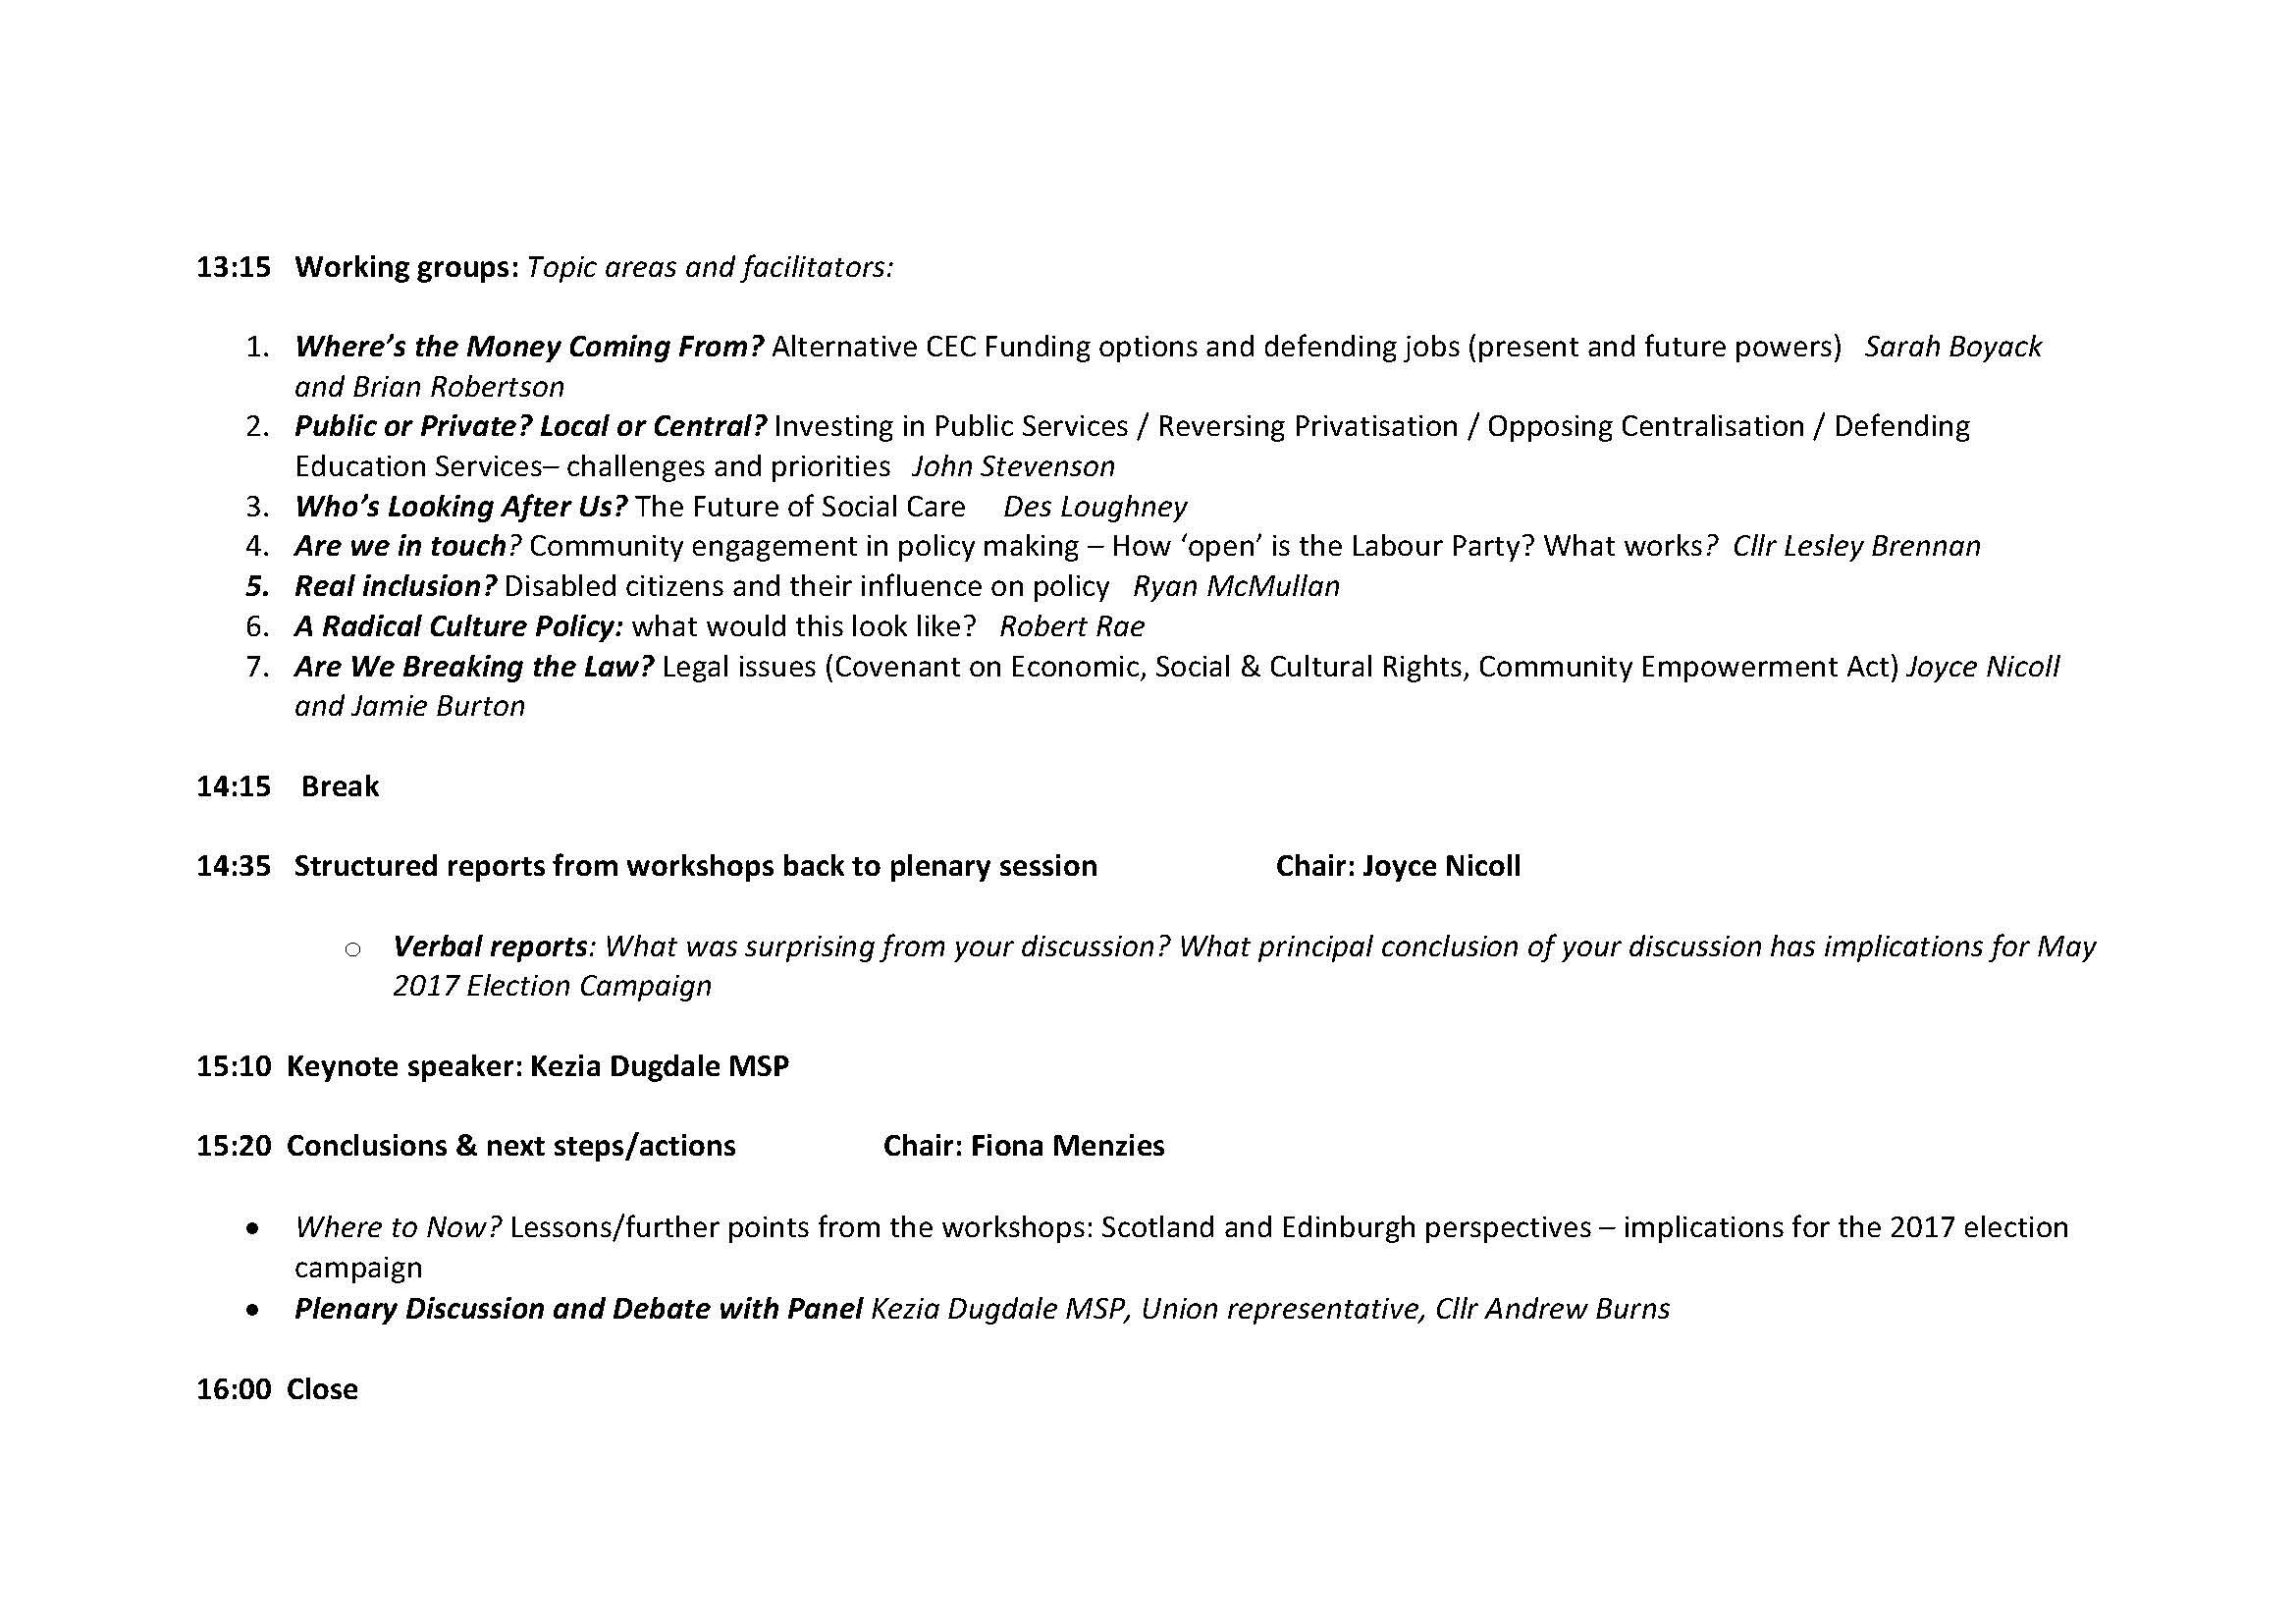 Edinburgh_Anti_Cuts_Conference__Delegate_Agenda_Page_2.jpg